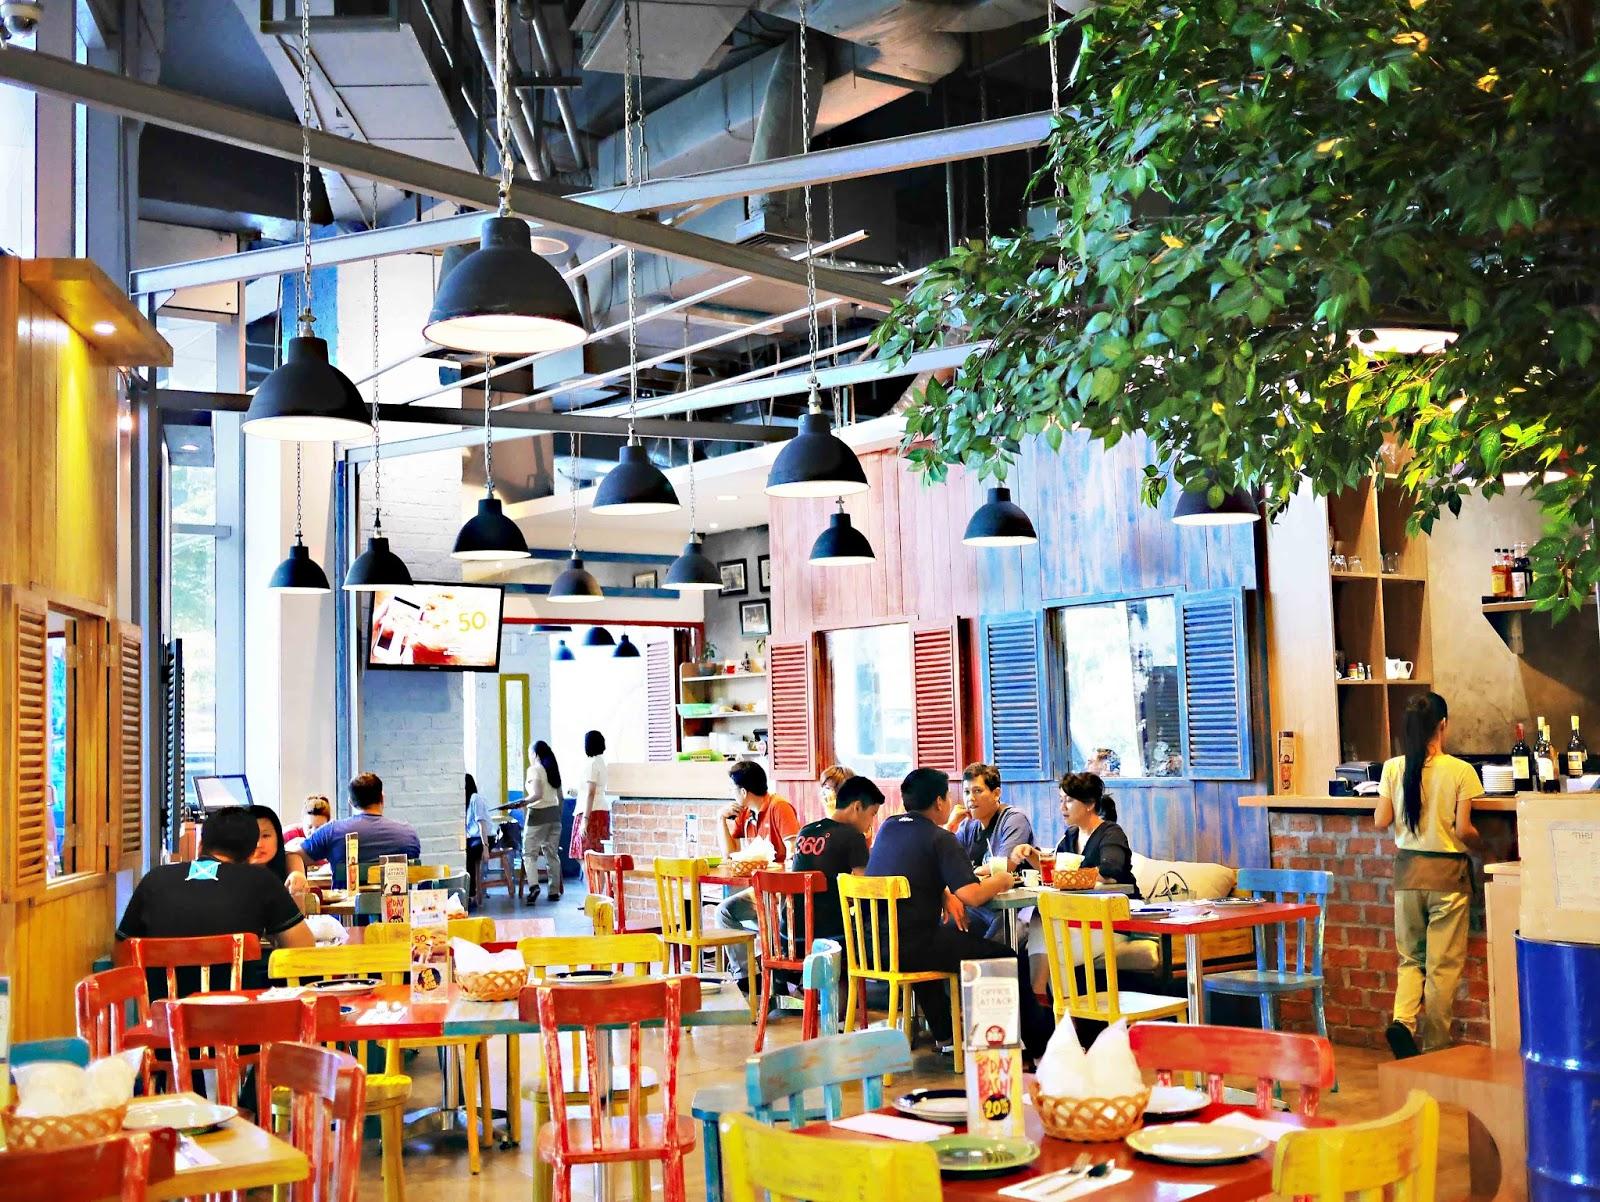 restoran Thailand enak murah di Jakarta, Thai Alley, anakkota.com